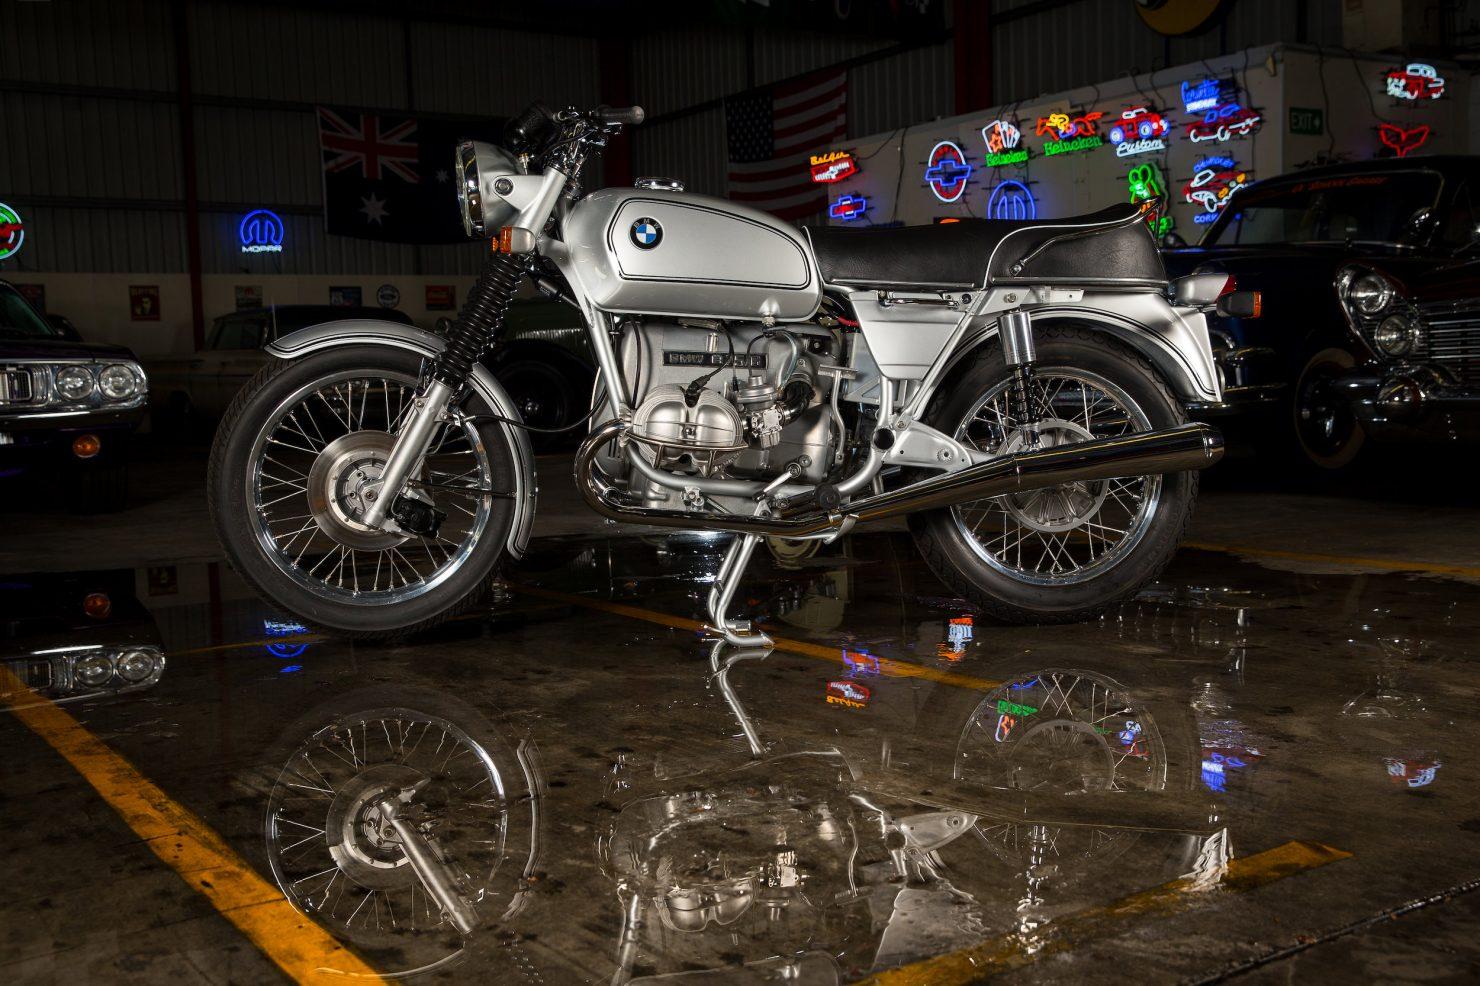 AM6P0514 1480x986 - Immaculately Restored: BMW R75/6